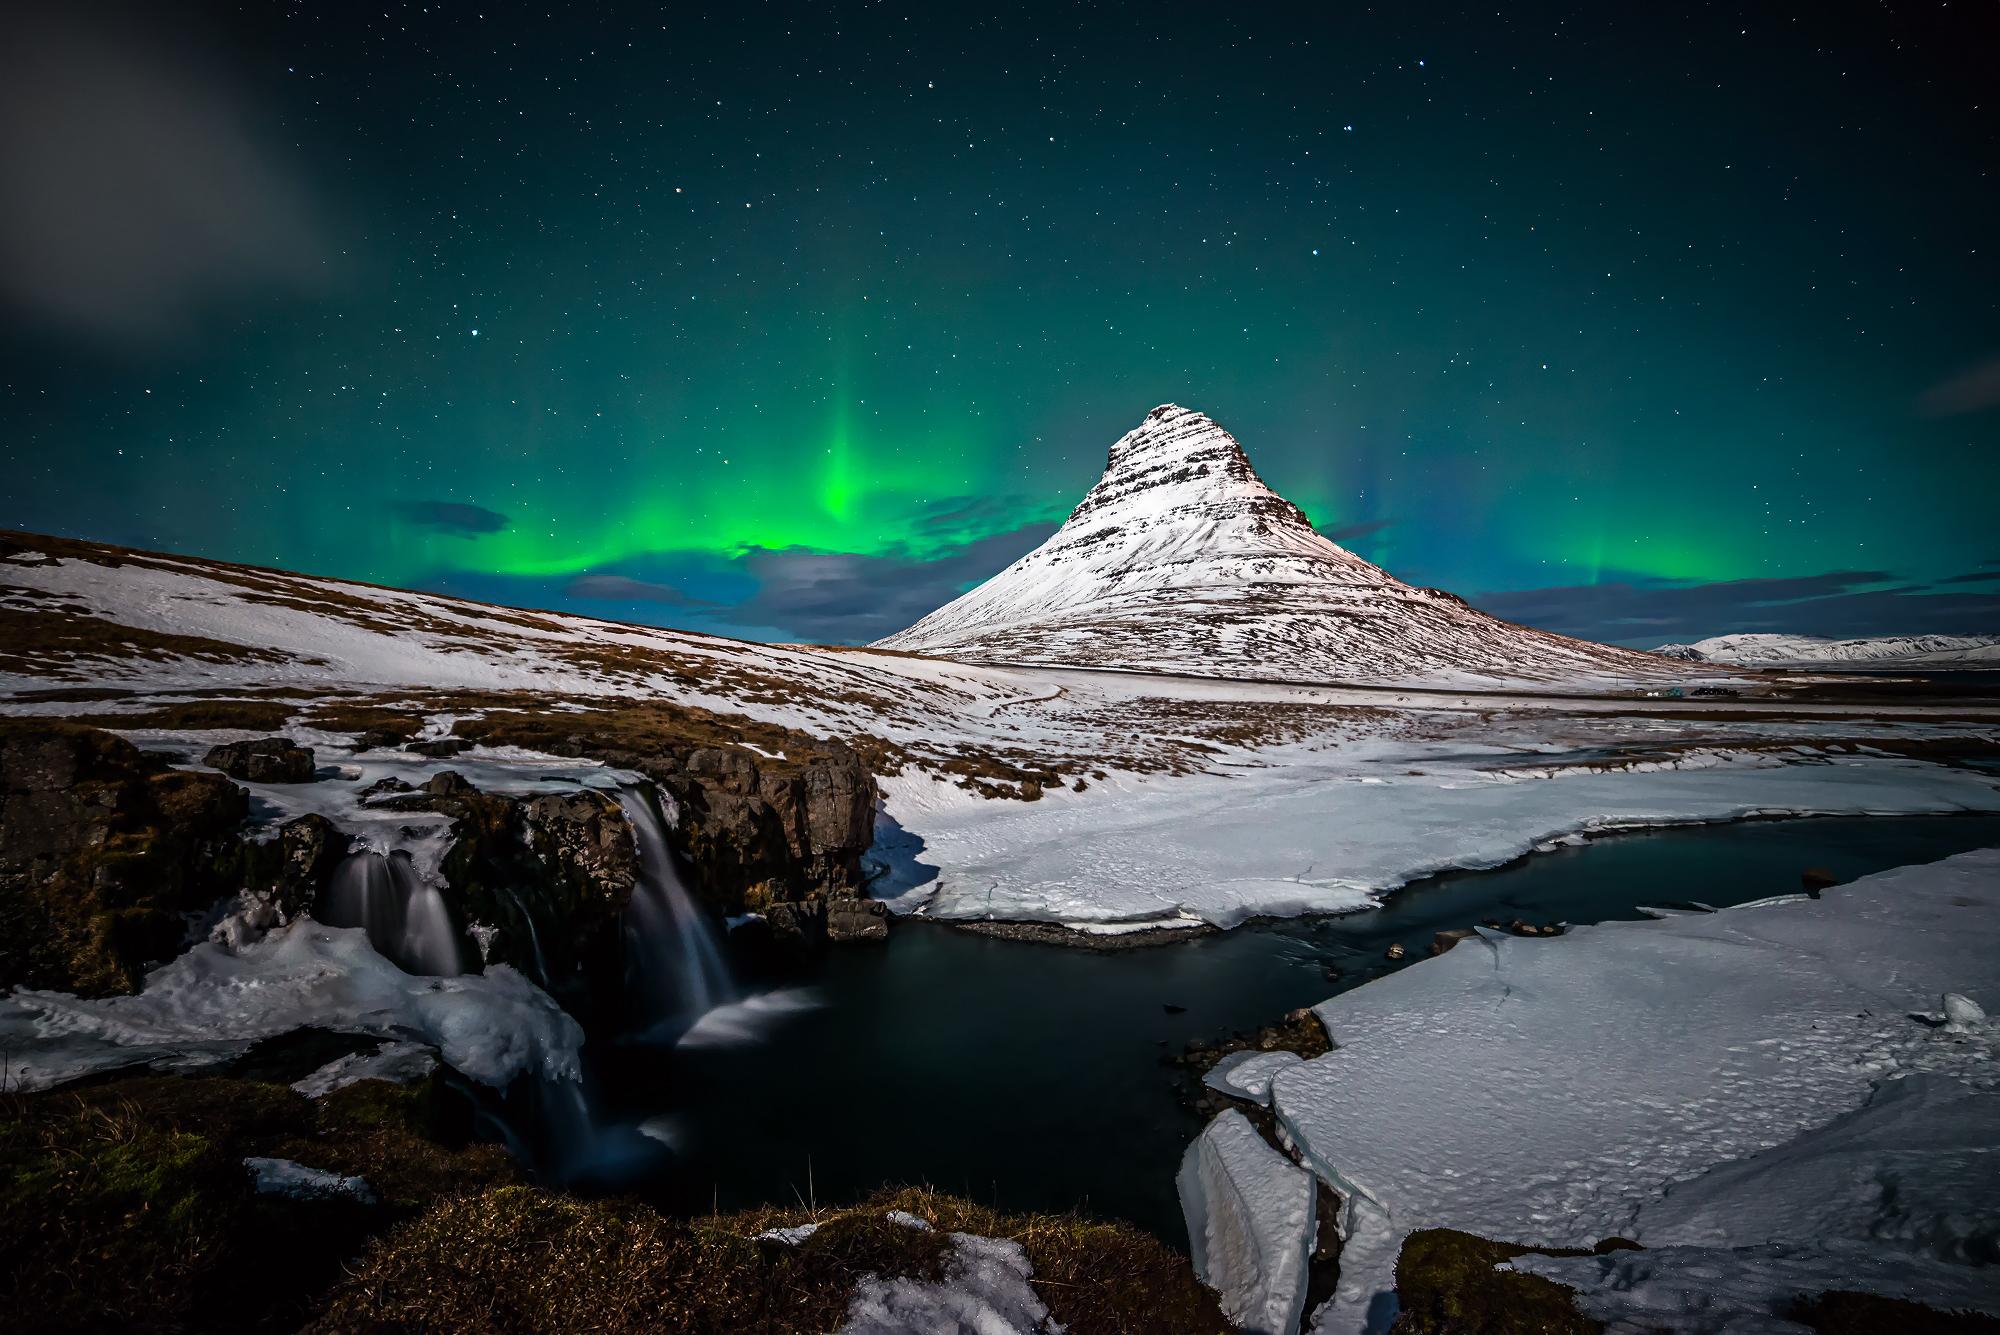 Aurora boreale wallpapers sfondi 2000x1335 id 593059 for Sfondi desktop aurora boreale